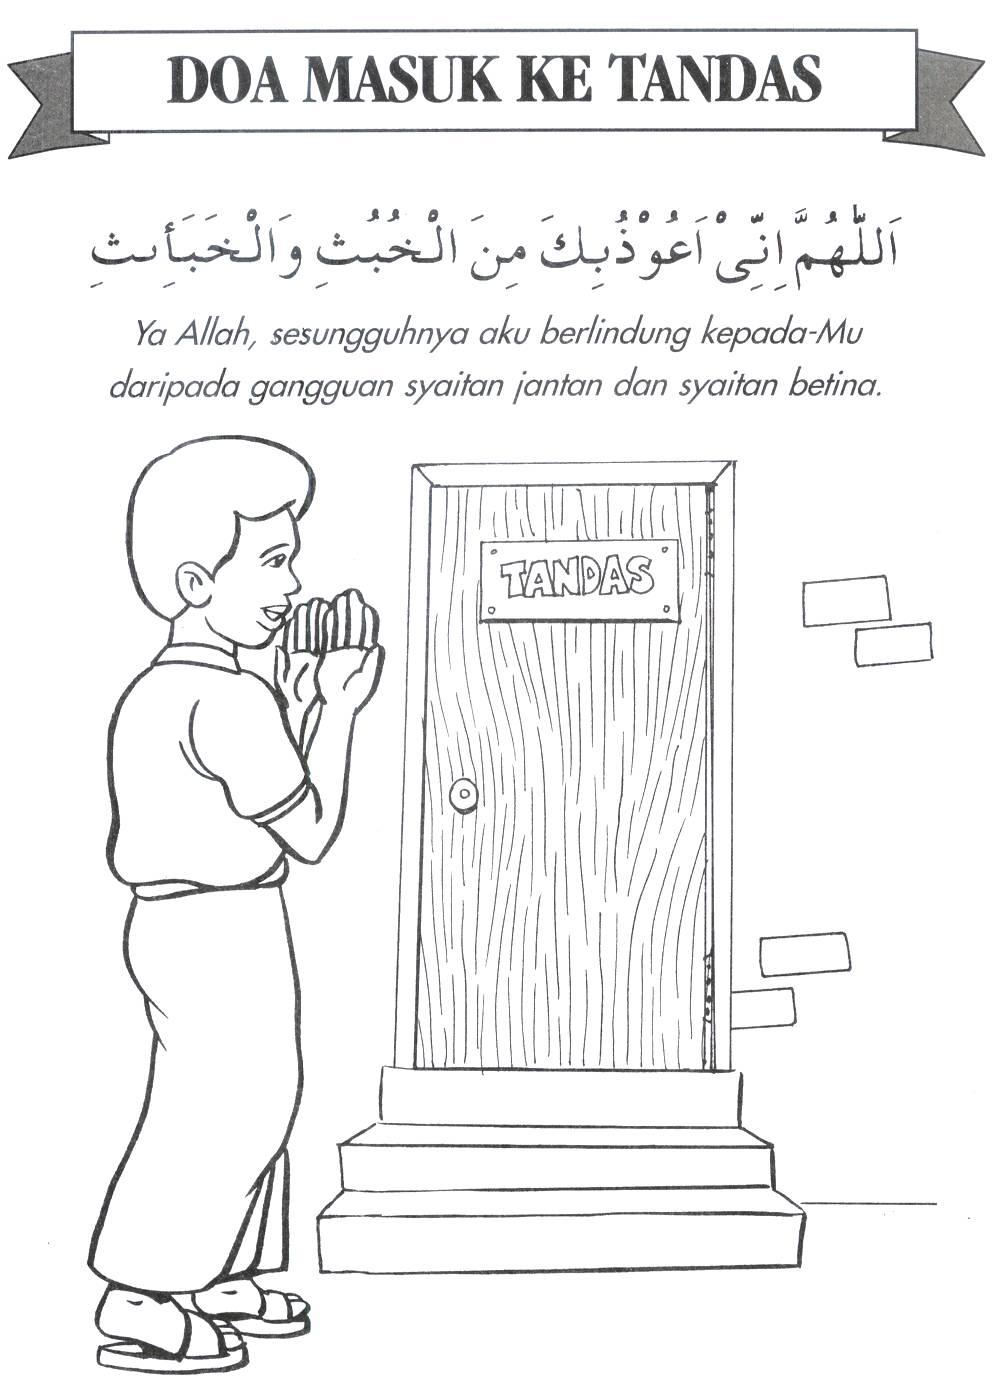 Portal Prasekolah Sk Danau Kota Carta Doa Harian